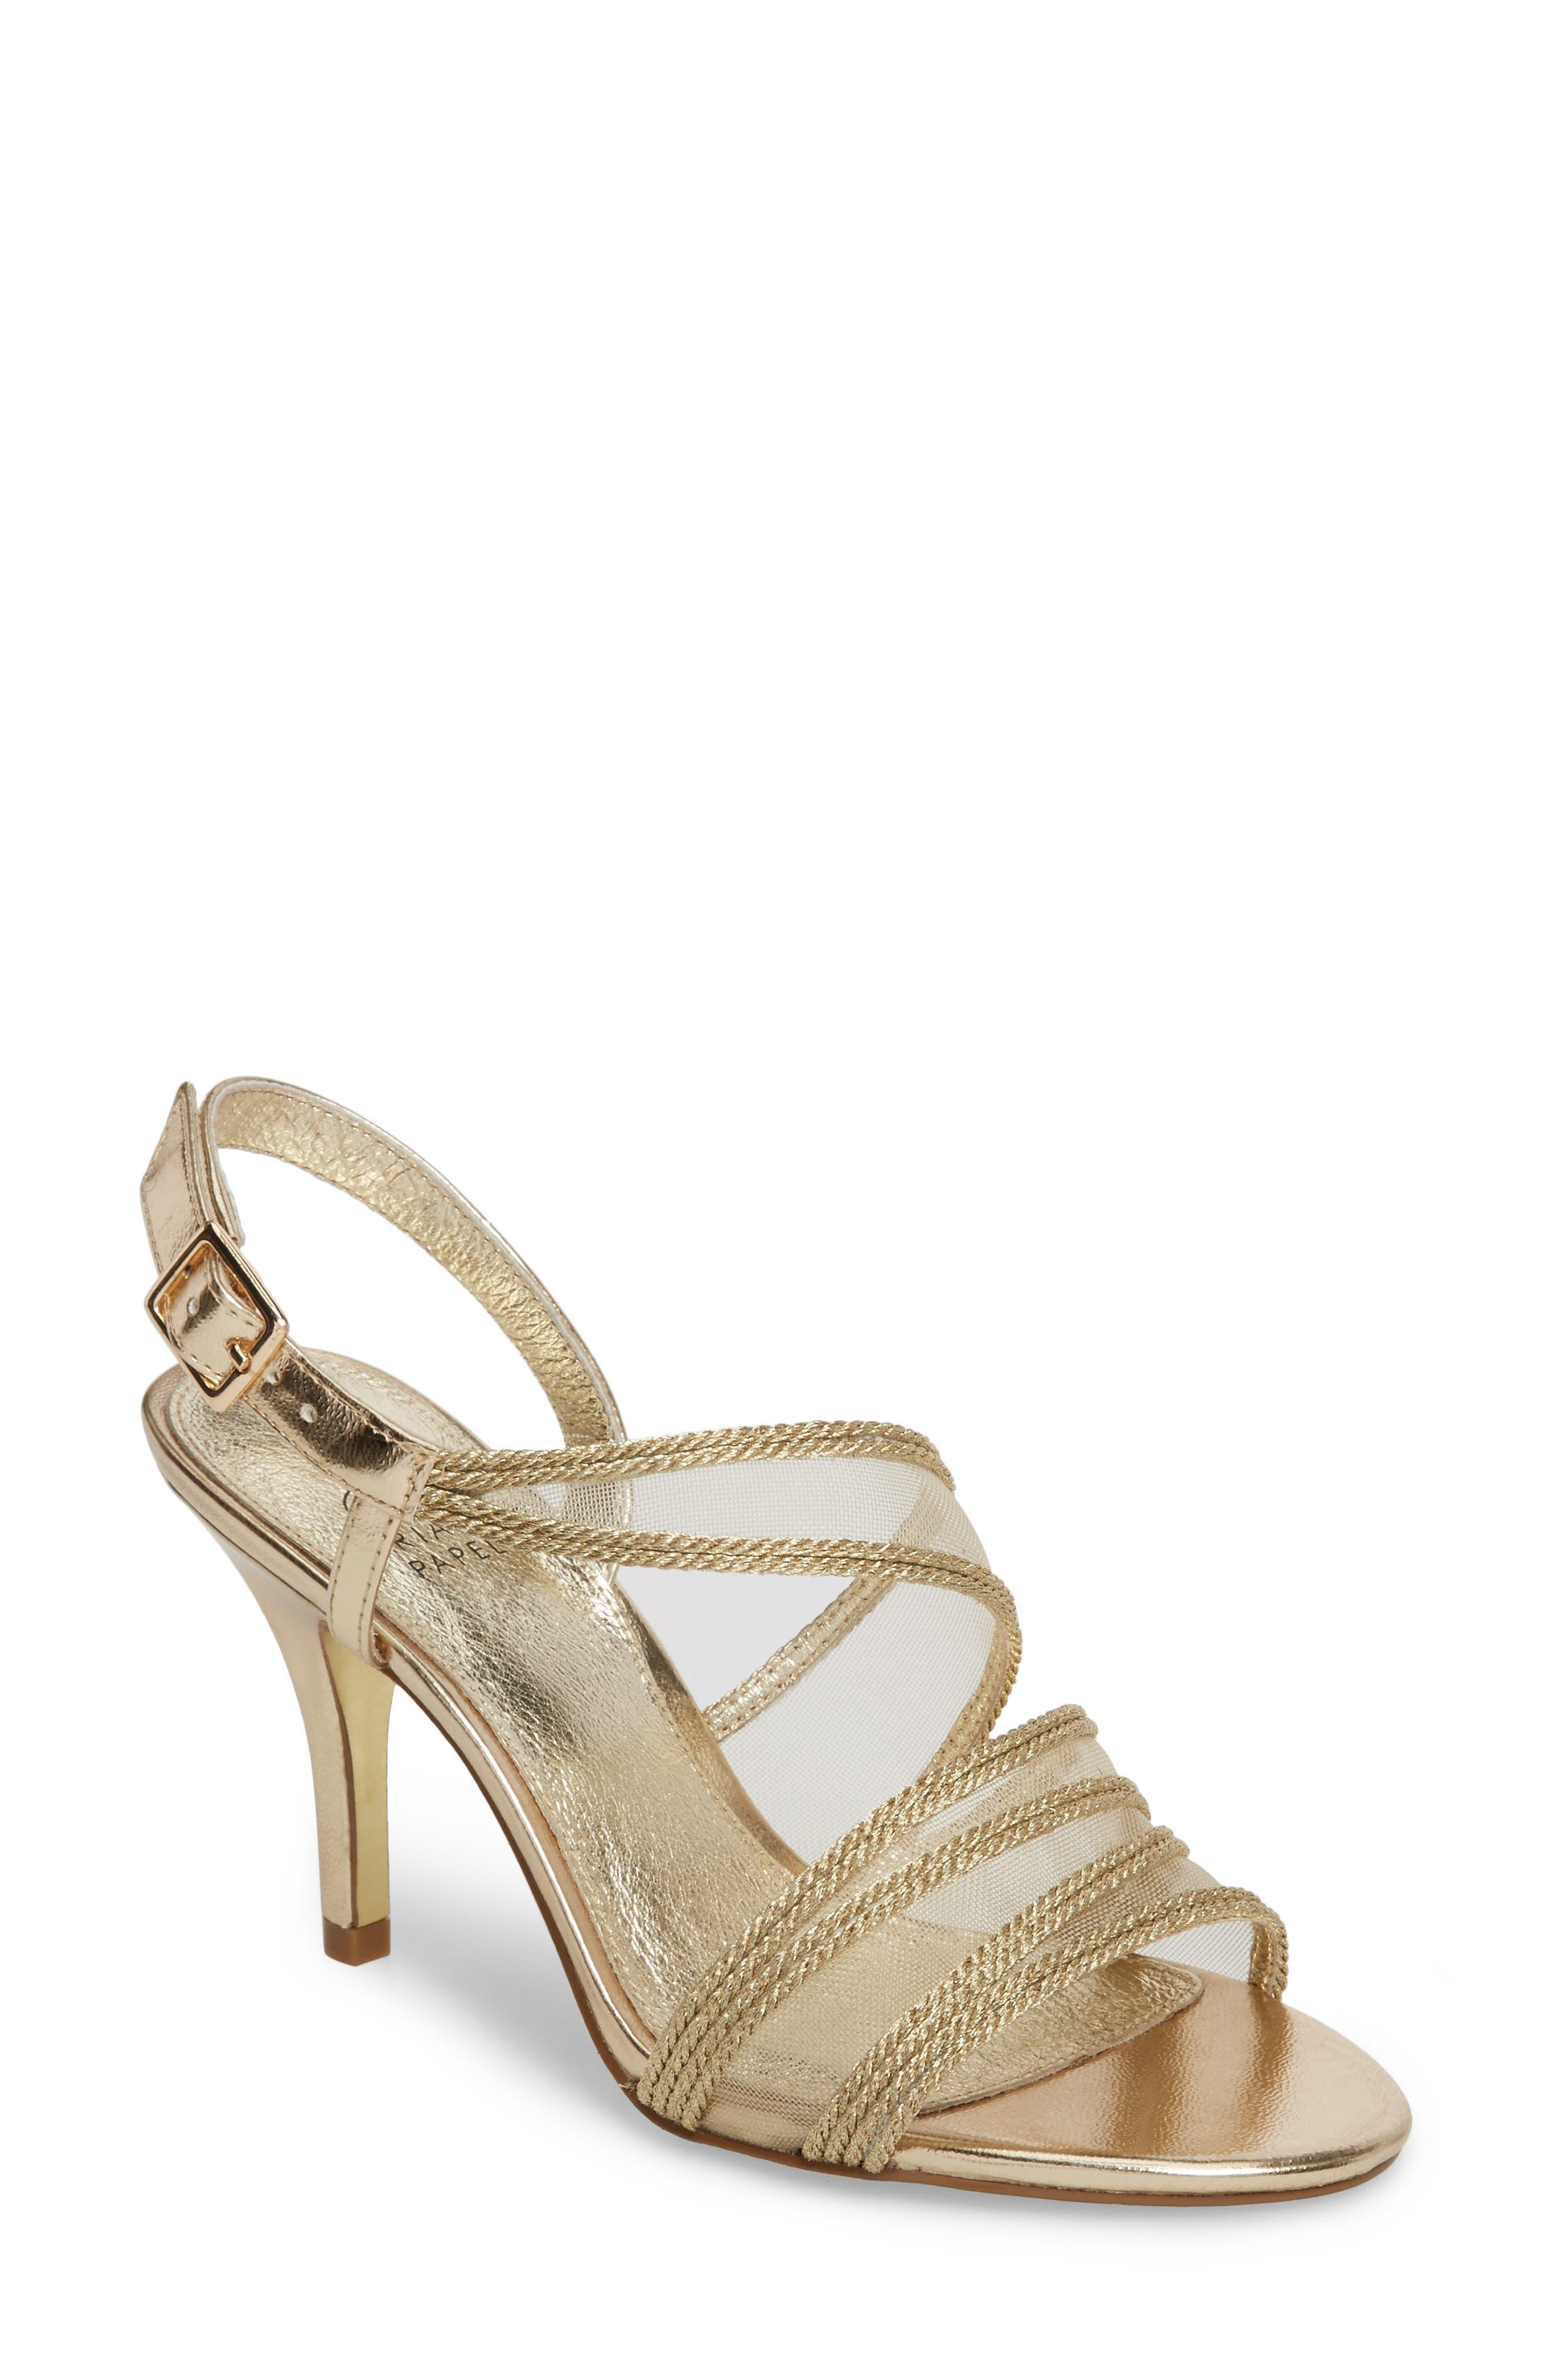 Adelphi Asymmetrical Mesh Sandal,                             Main thumbnail 1, color,                             Platinum Fabric